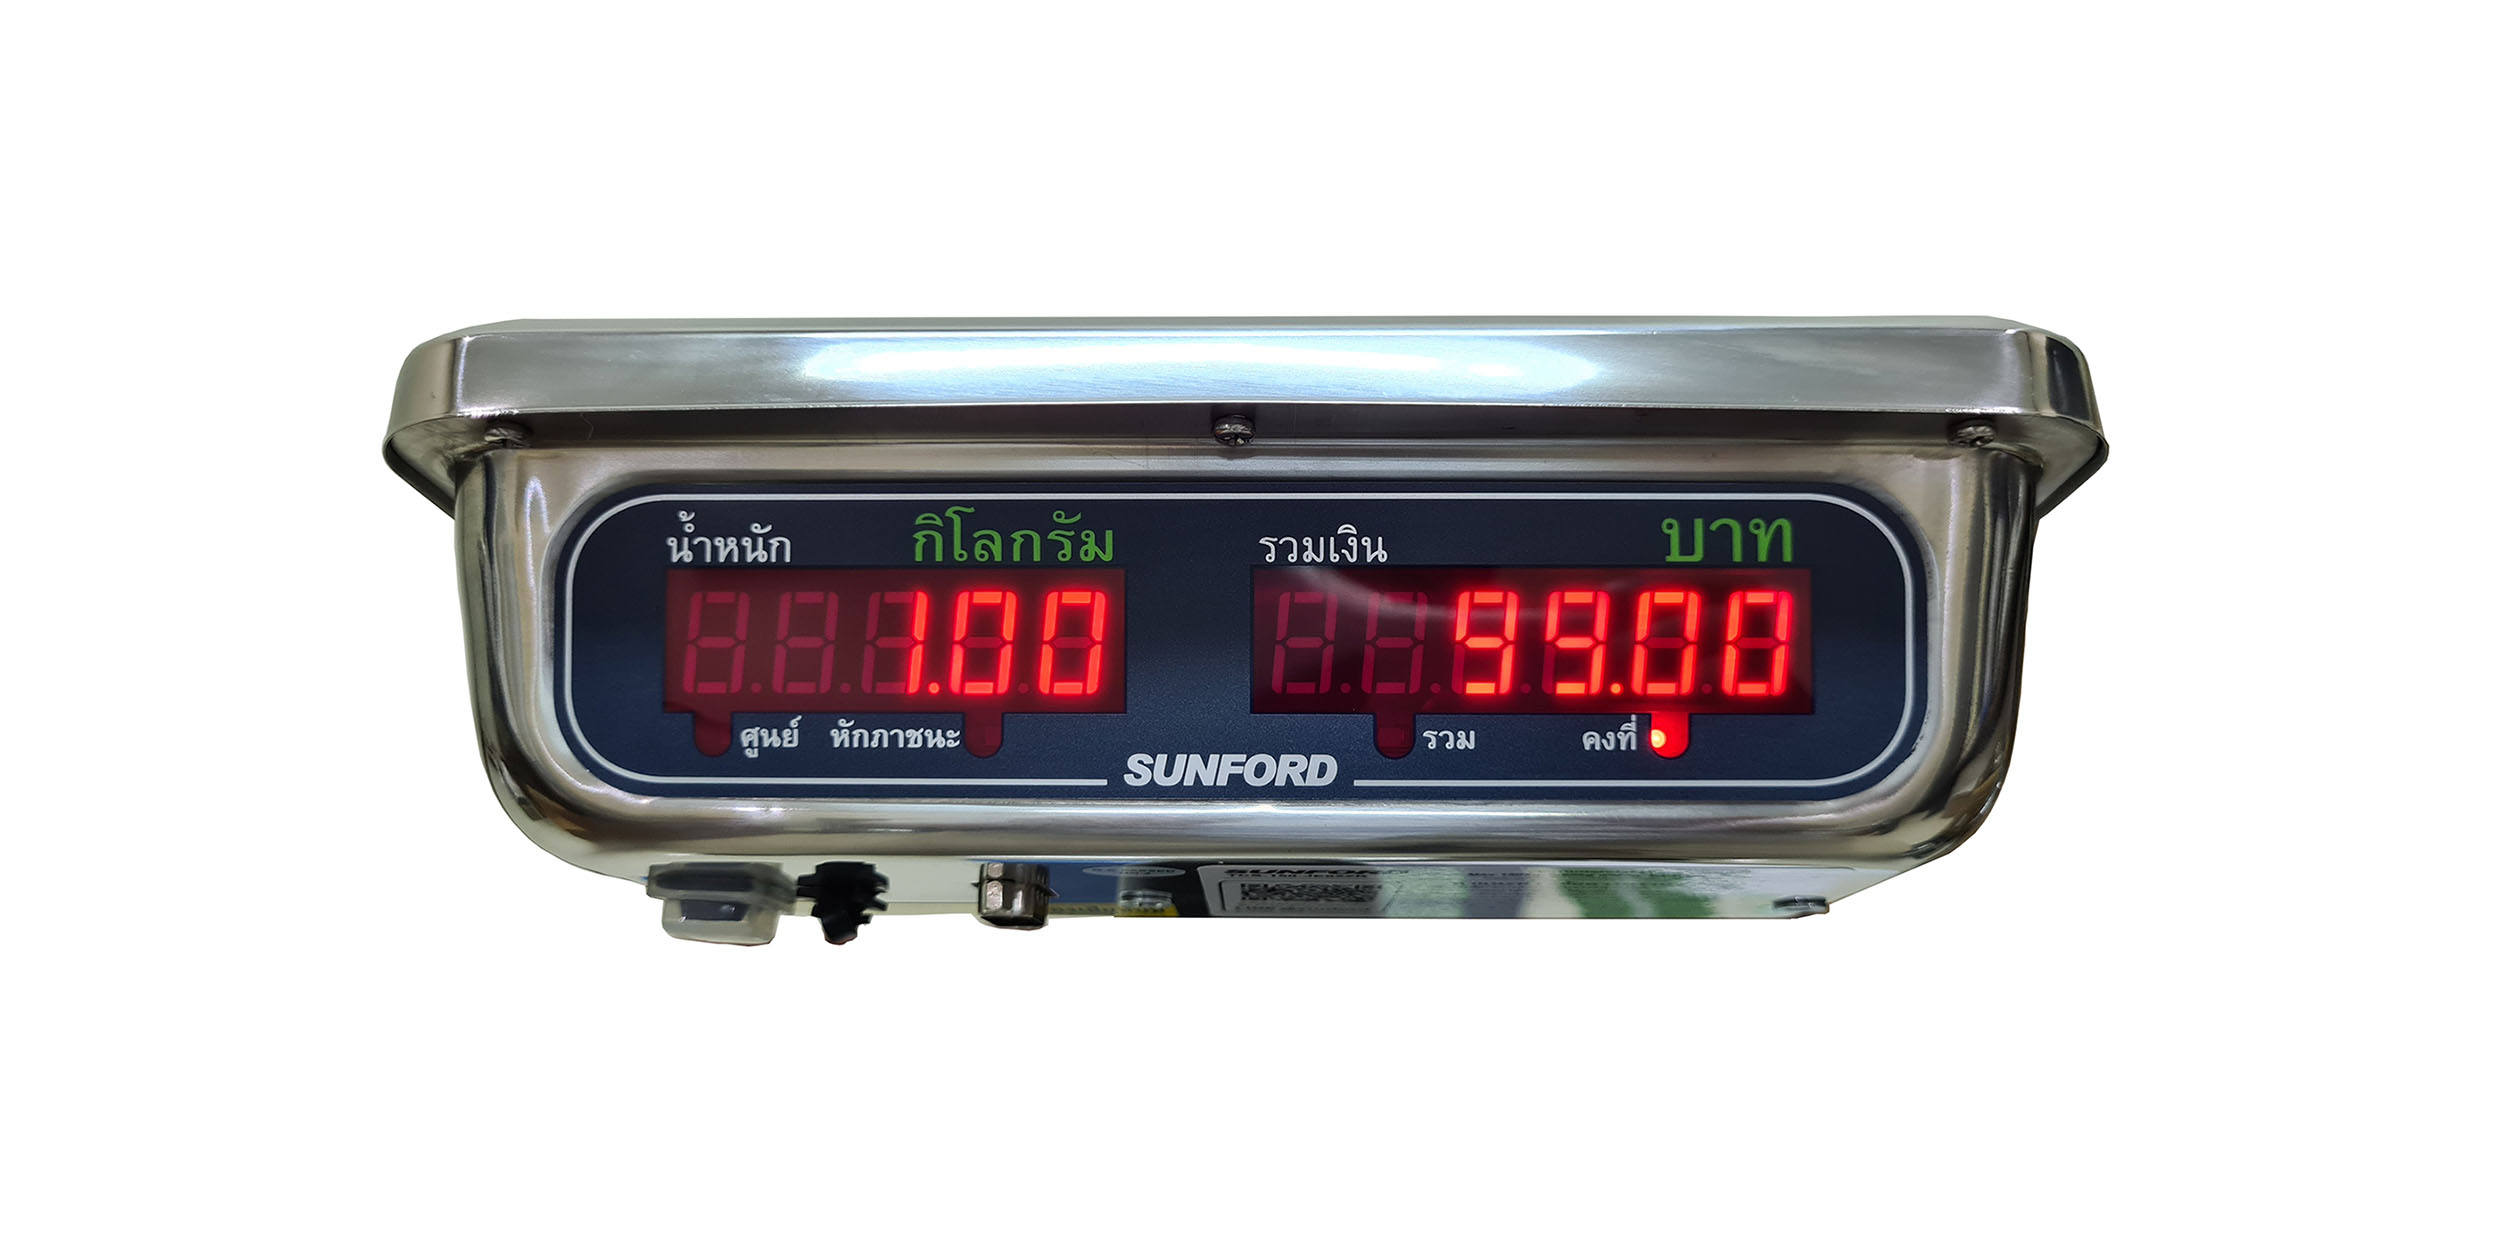 SUNFORD TCS-150-JE62ZR